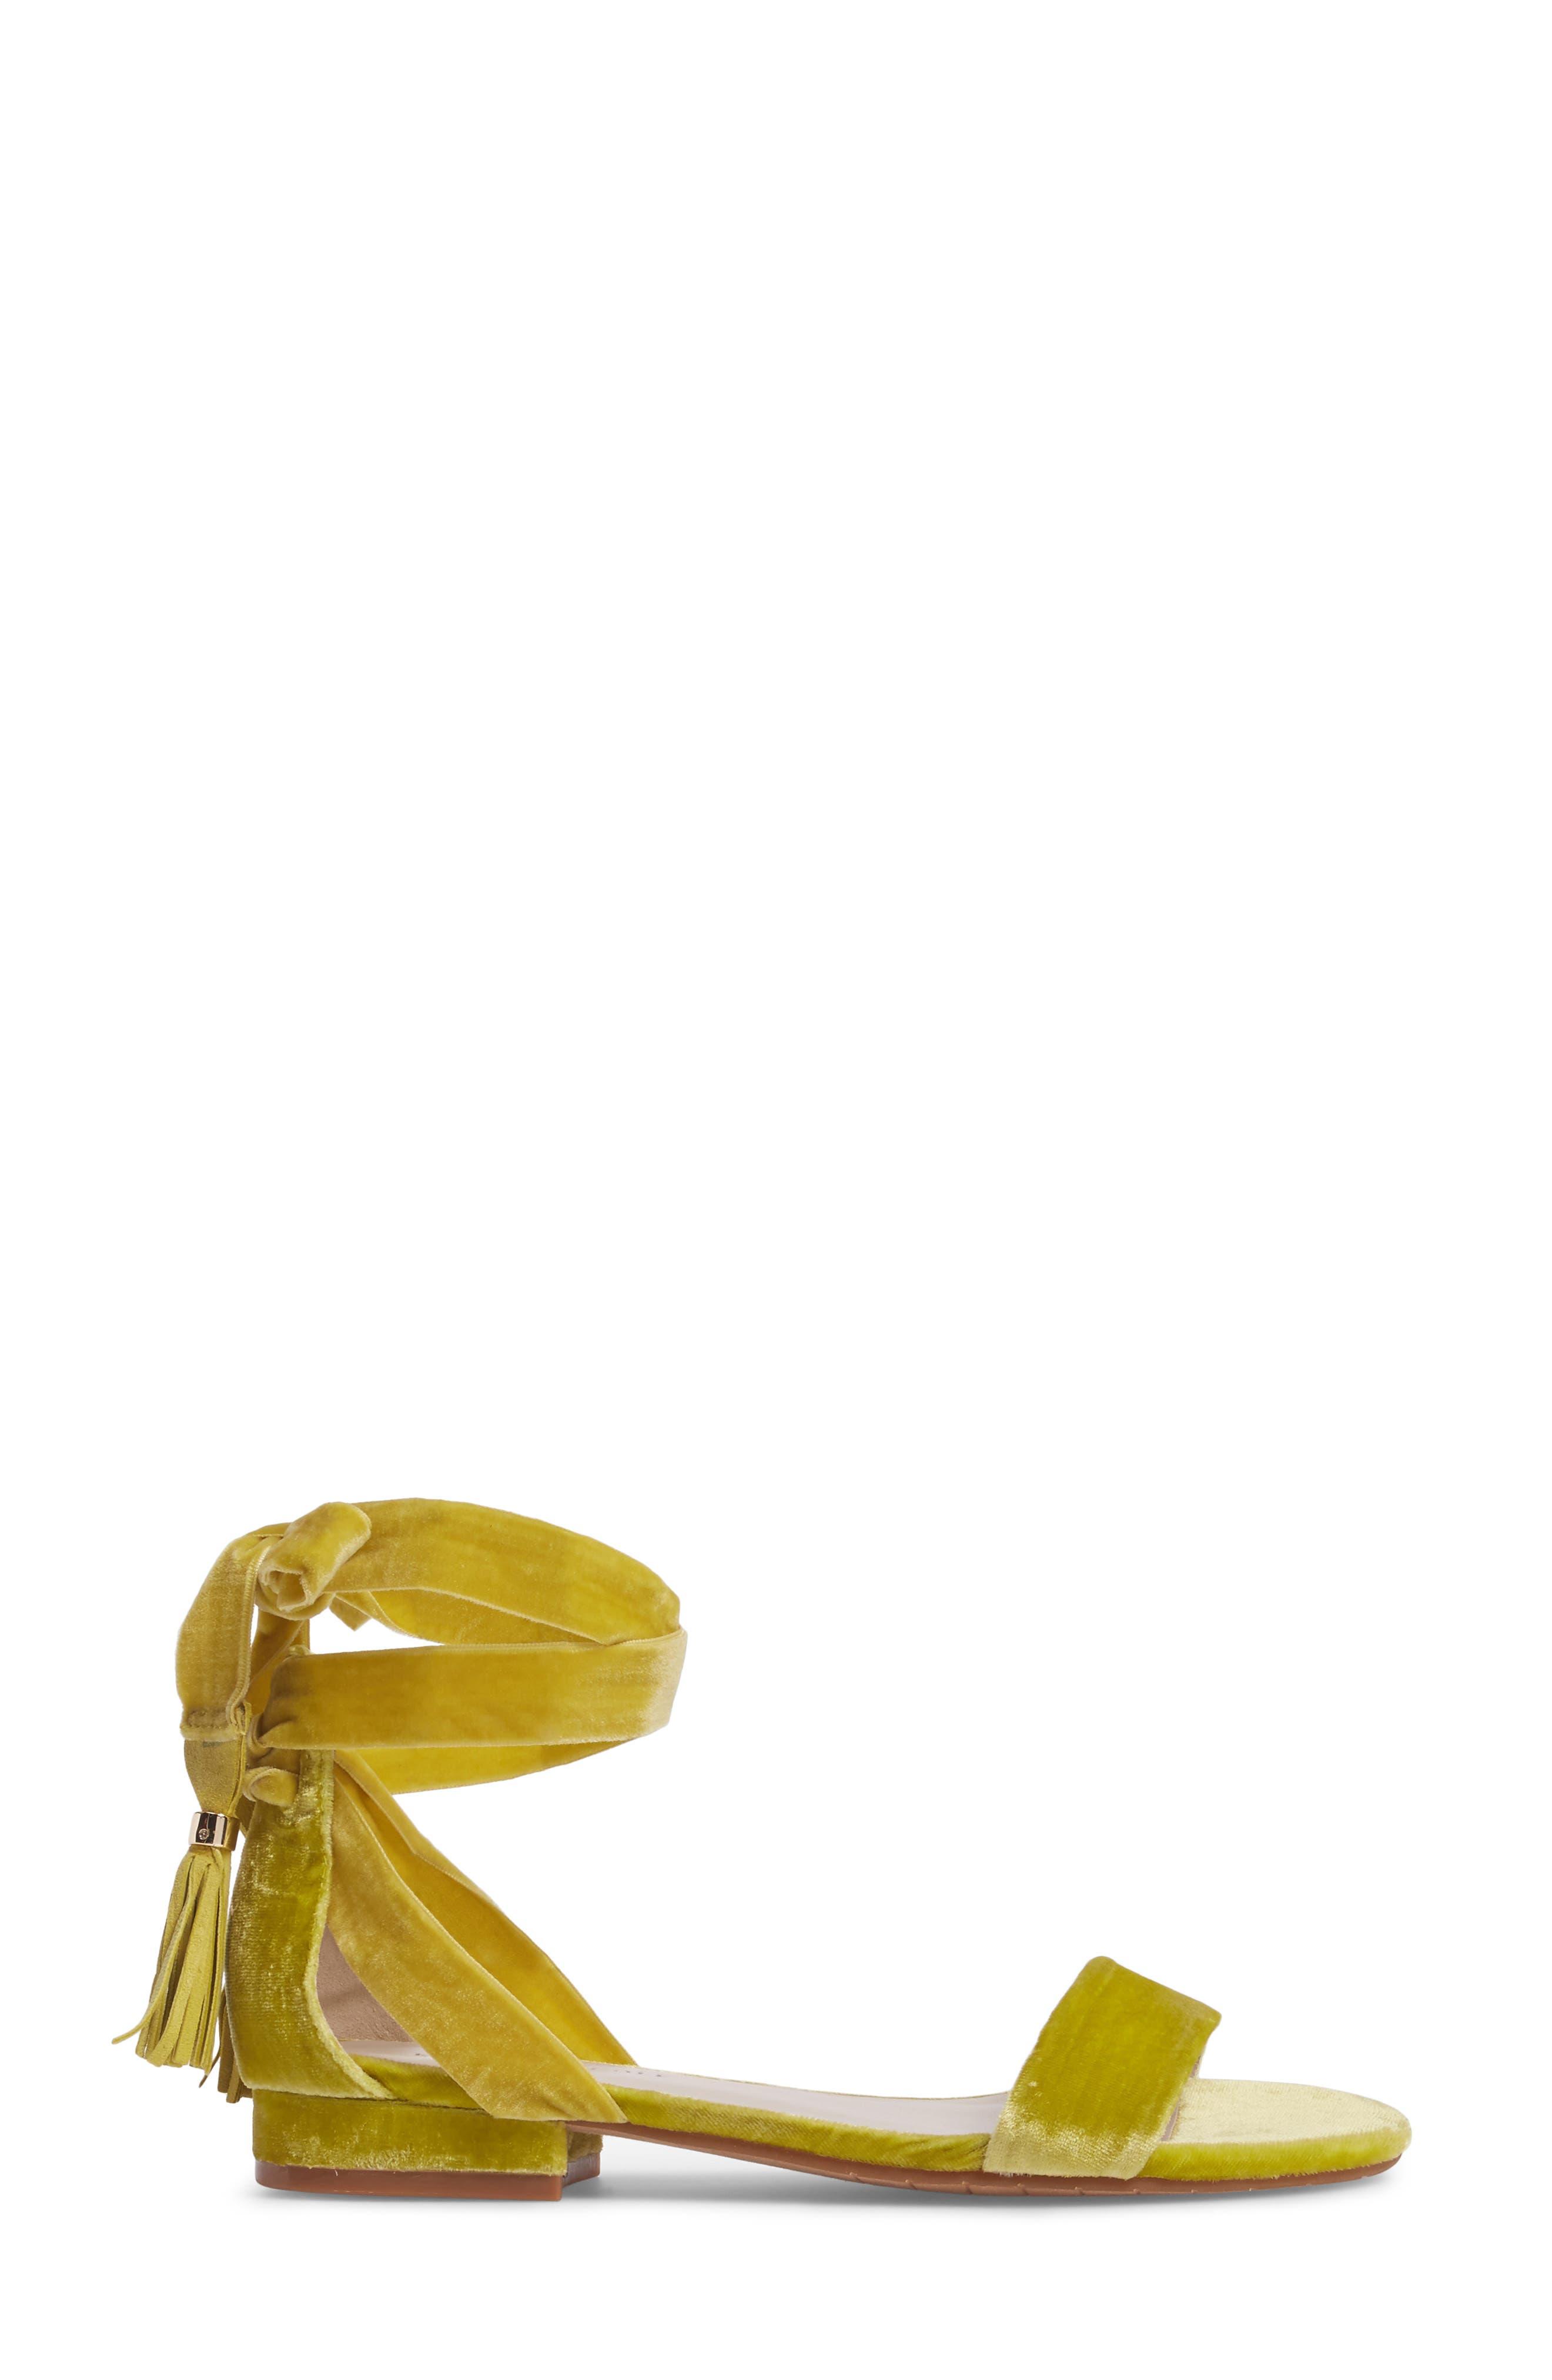 Valen Tassel Lace-Up Sandal,                             Alternate thumbnail 35, color,